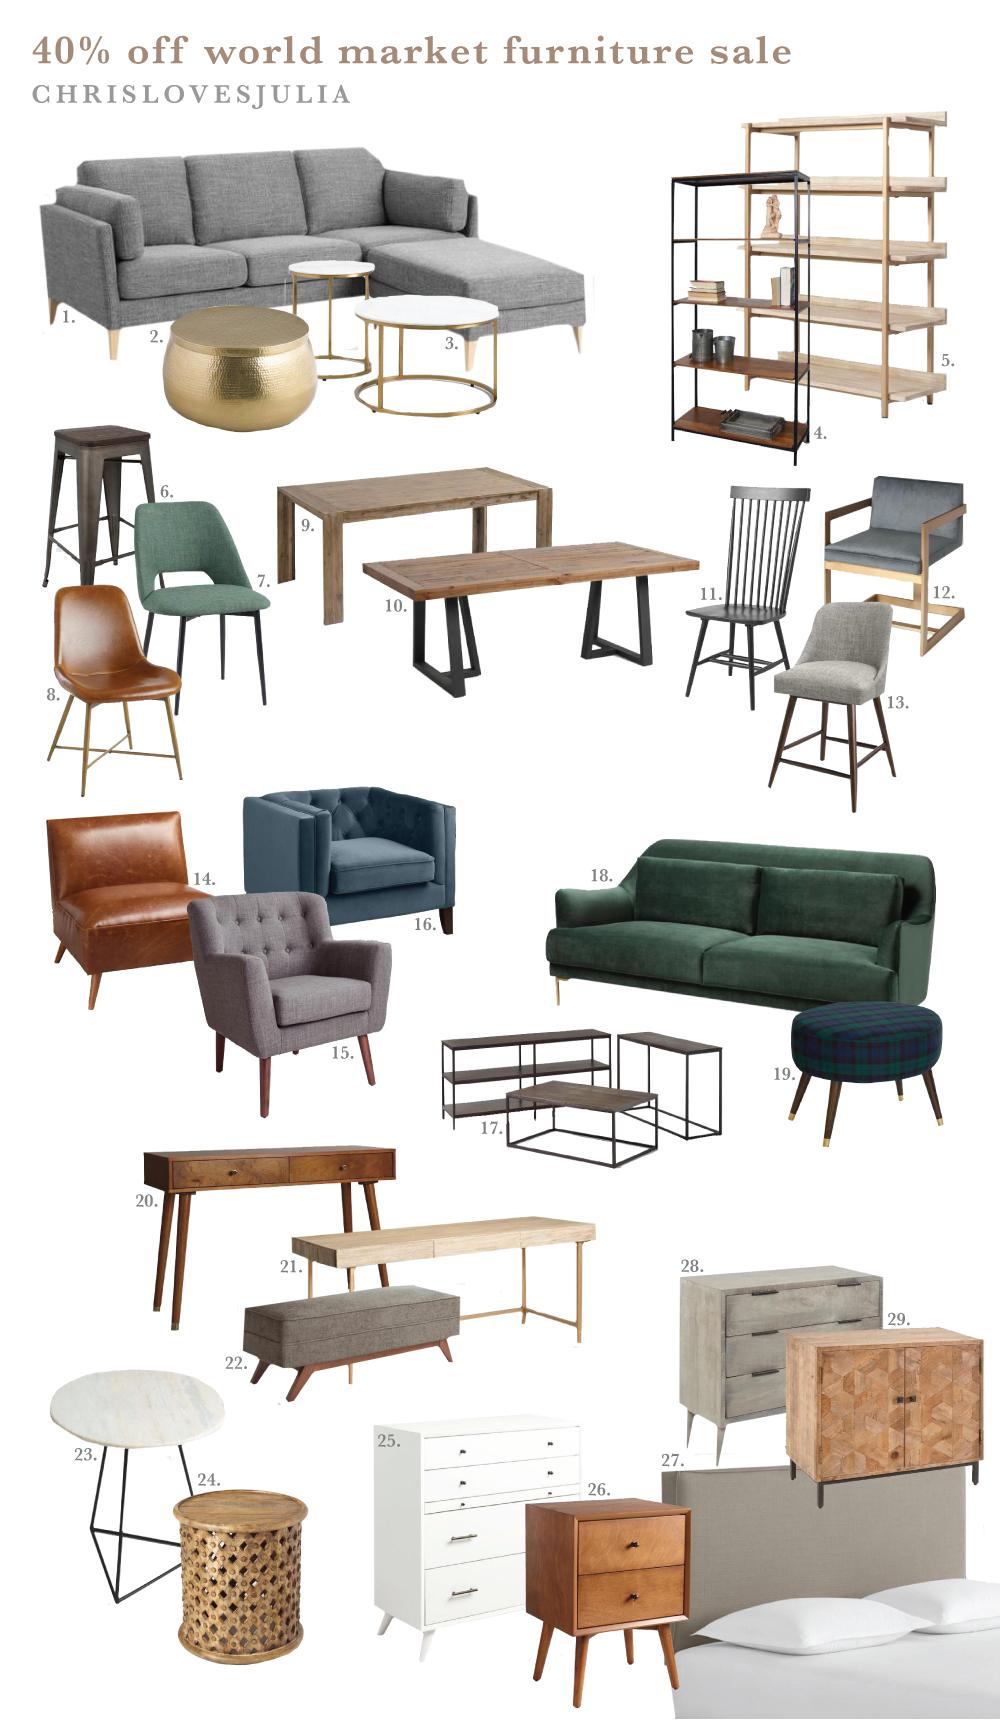 The Big 40 Off World Market Furniture Sale My Holiday Picks Chris Loves Julia